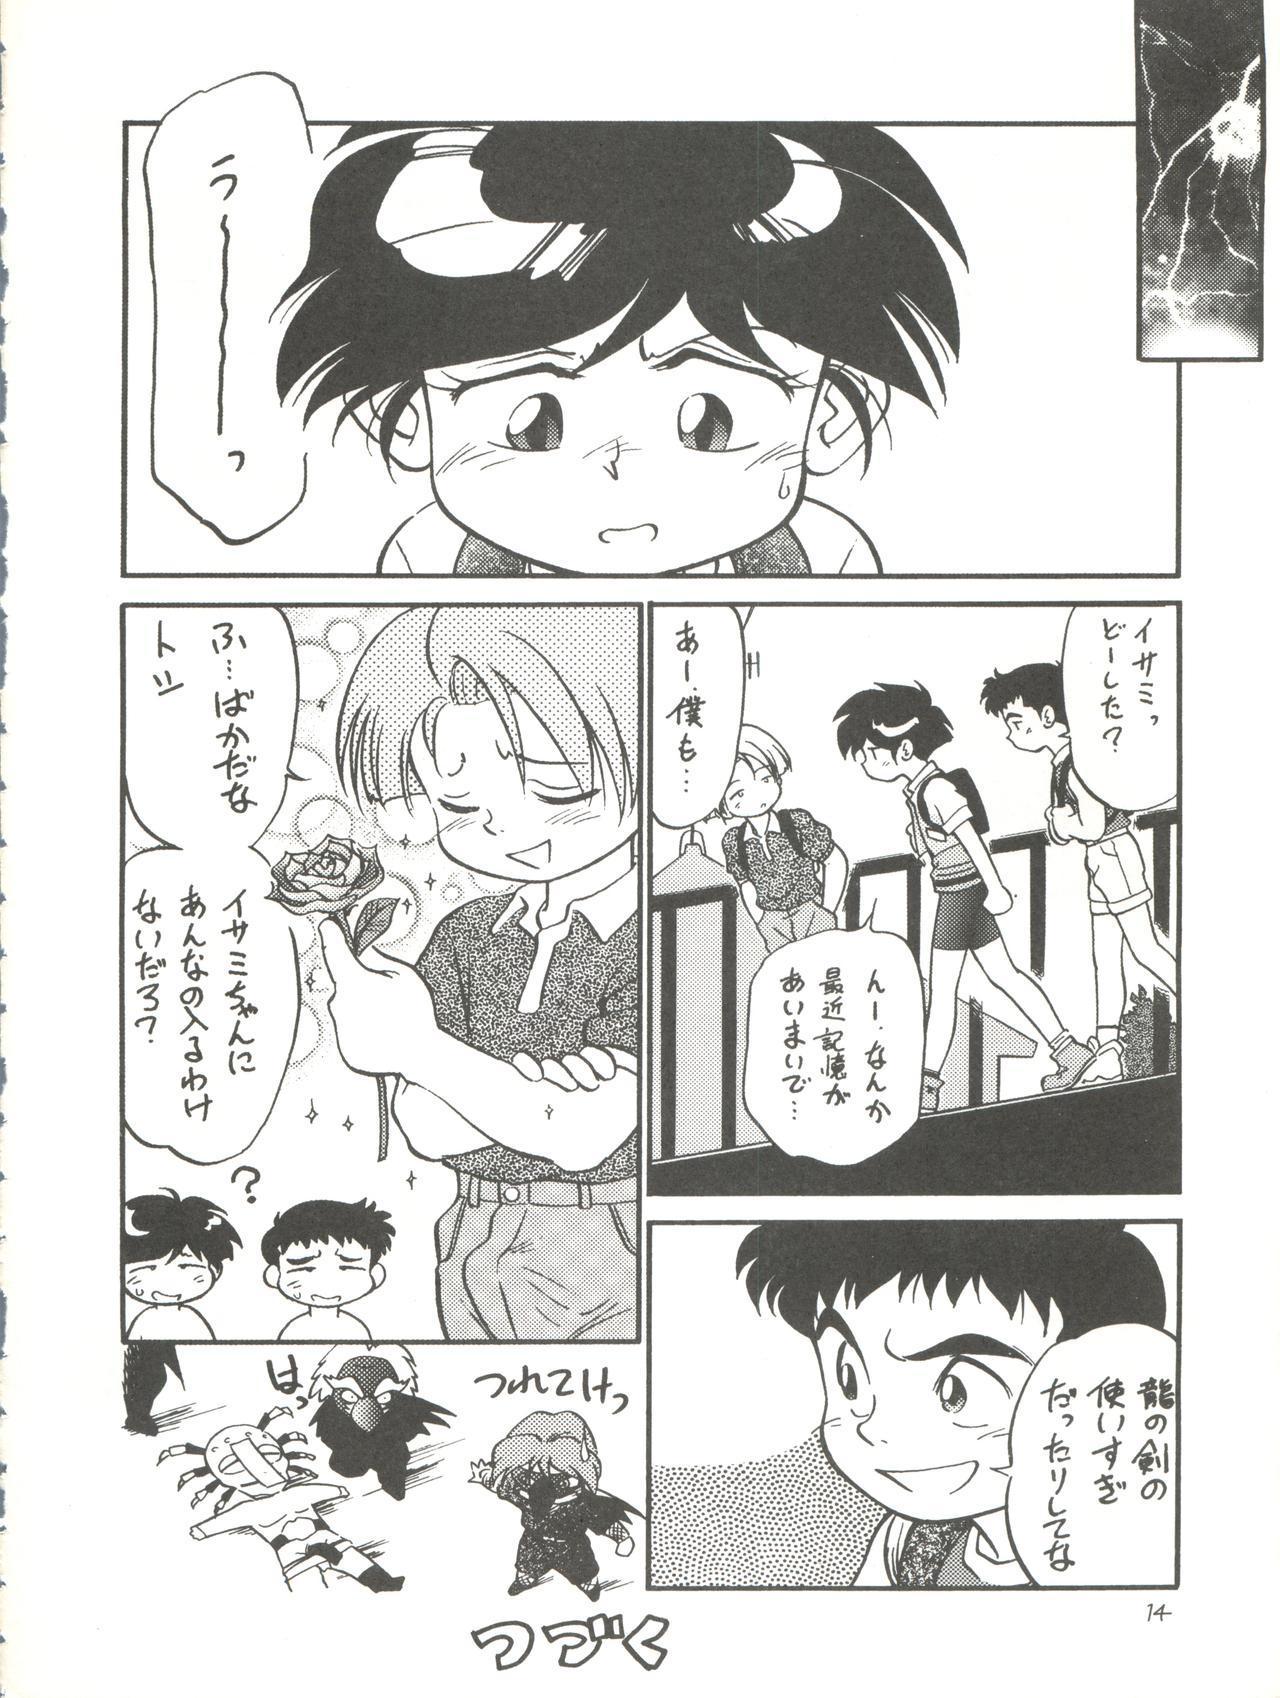 Kaiketsu Spats 13